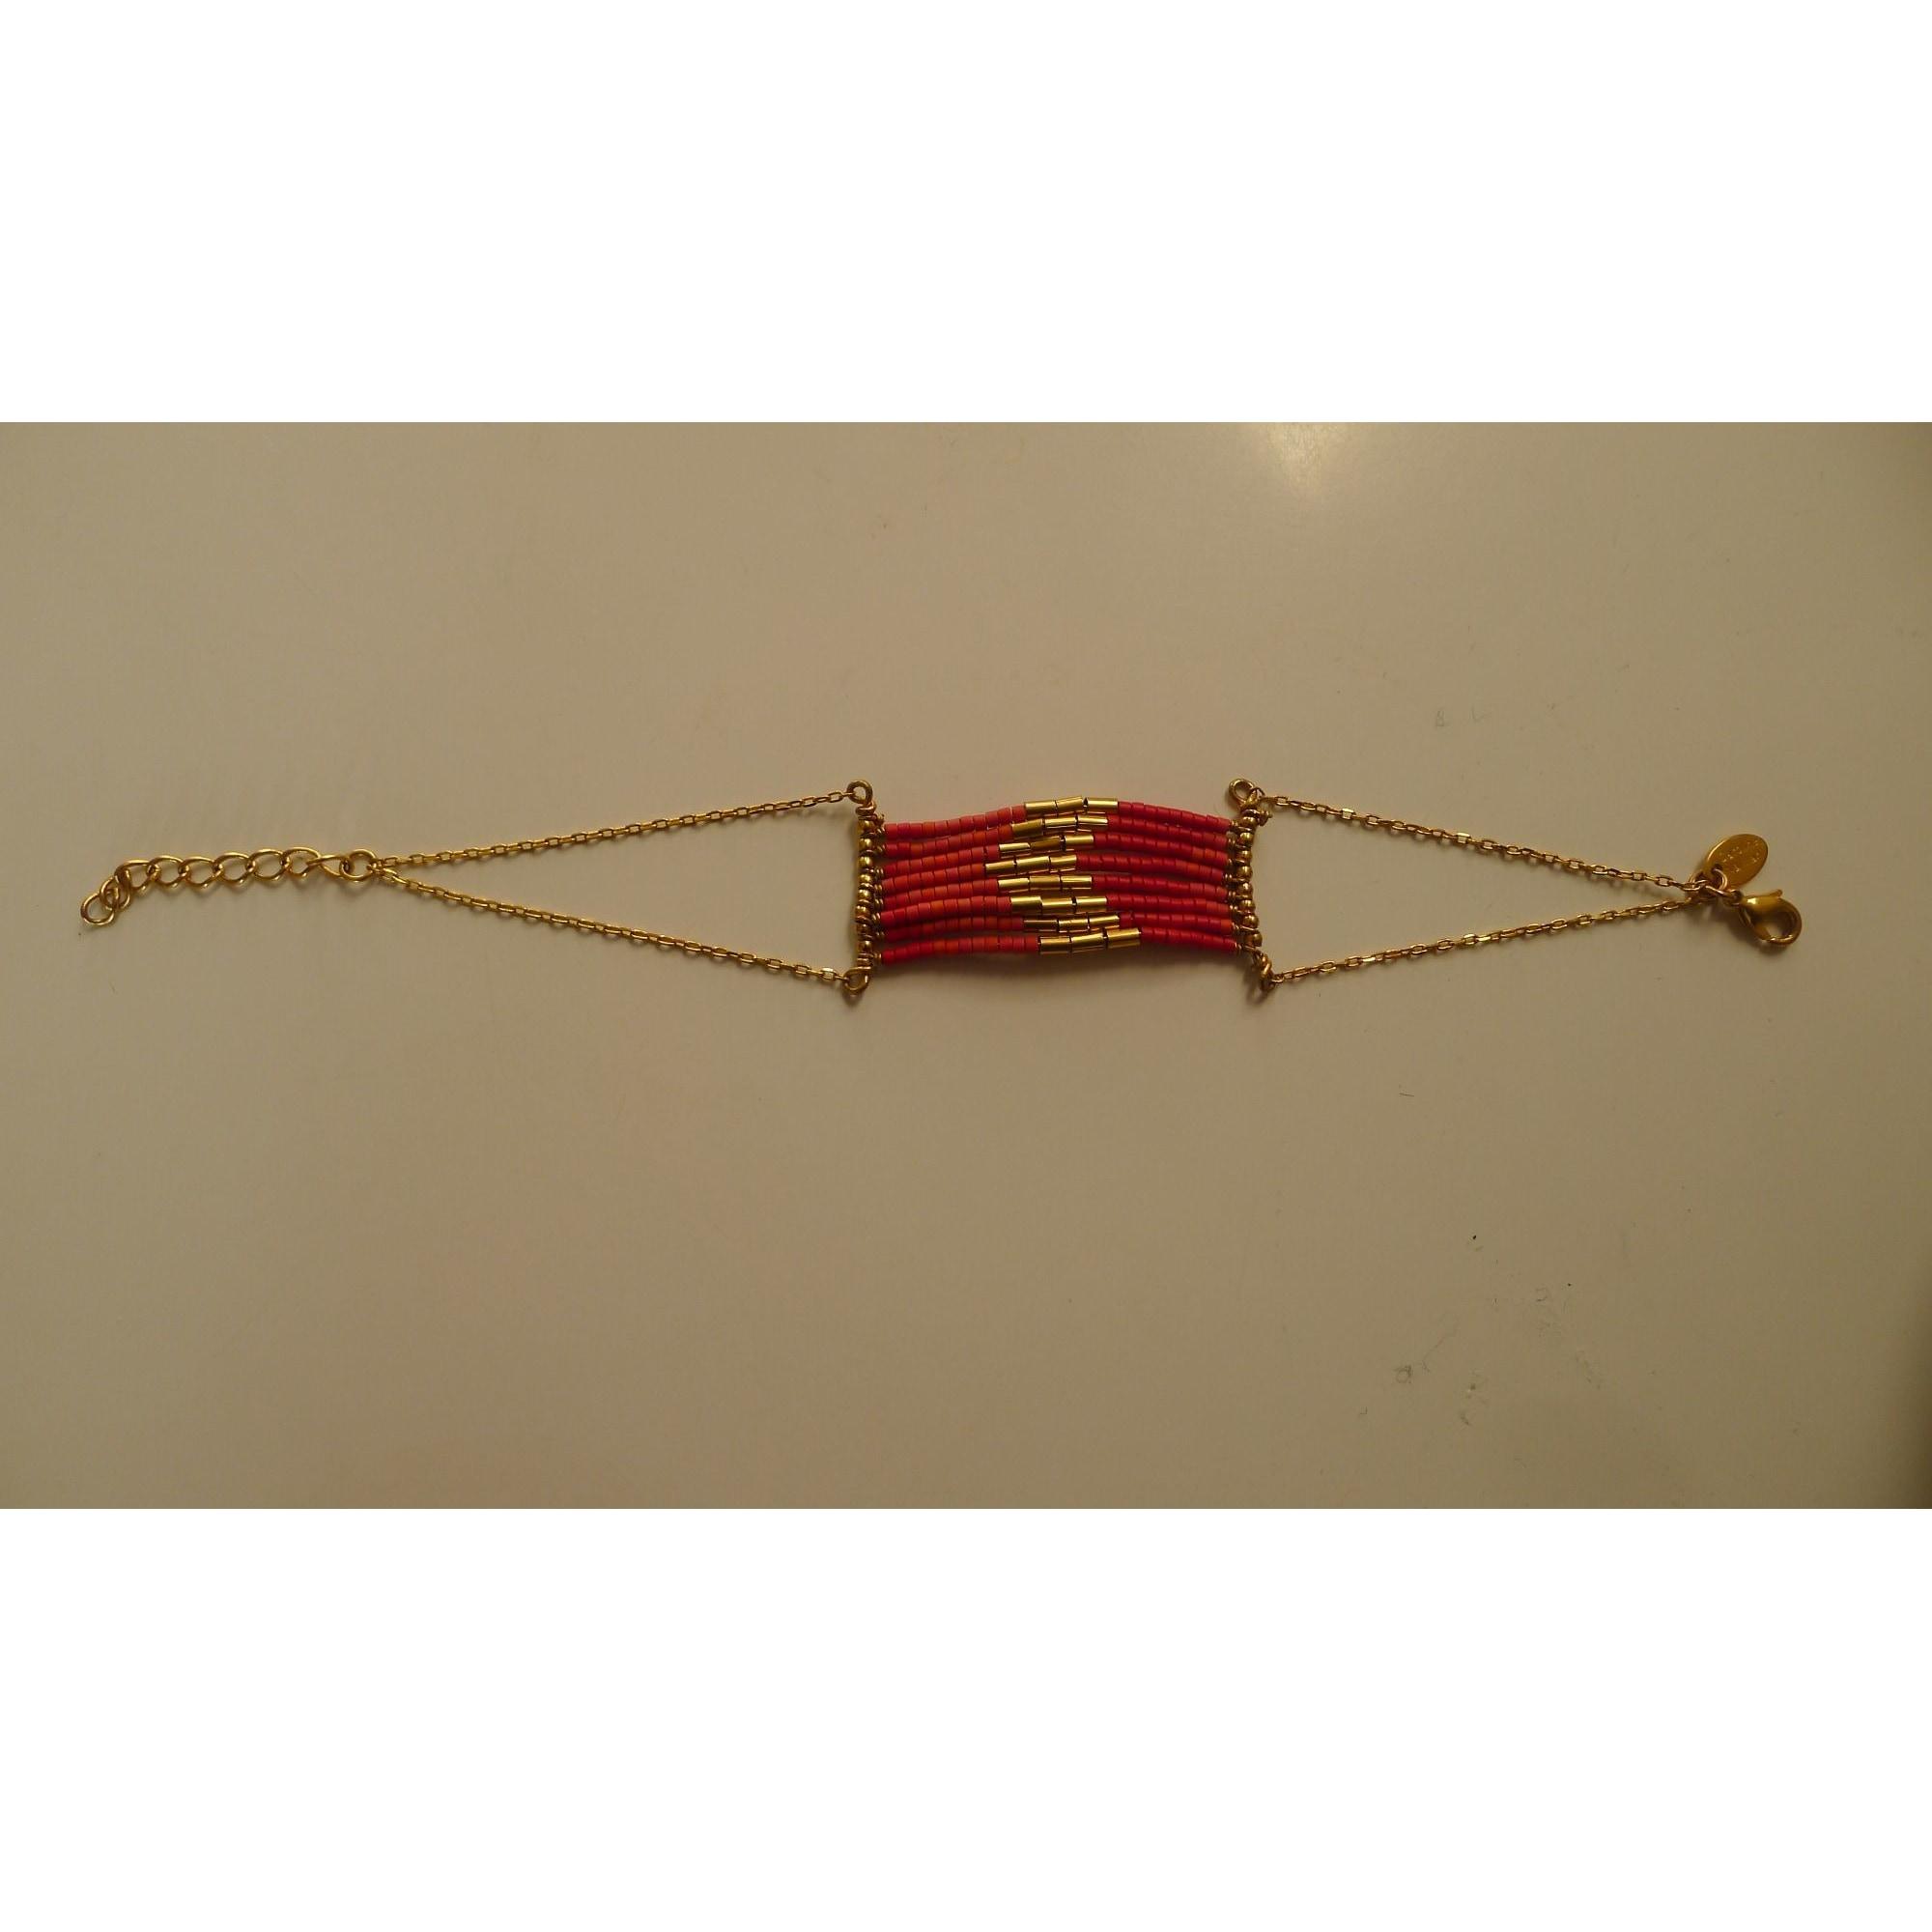 Bracelet CAROLINE NAJMAN Rouge, bordeaux